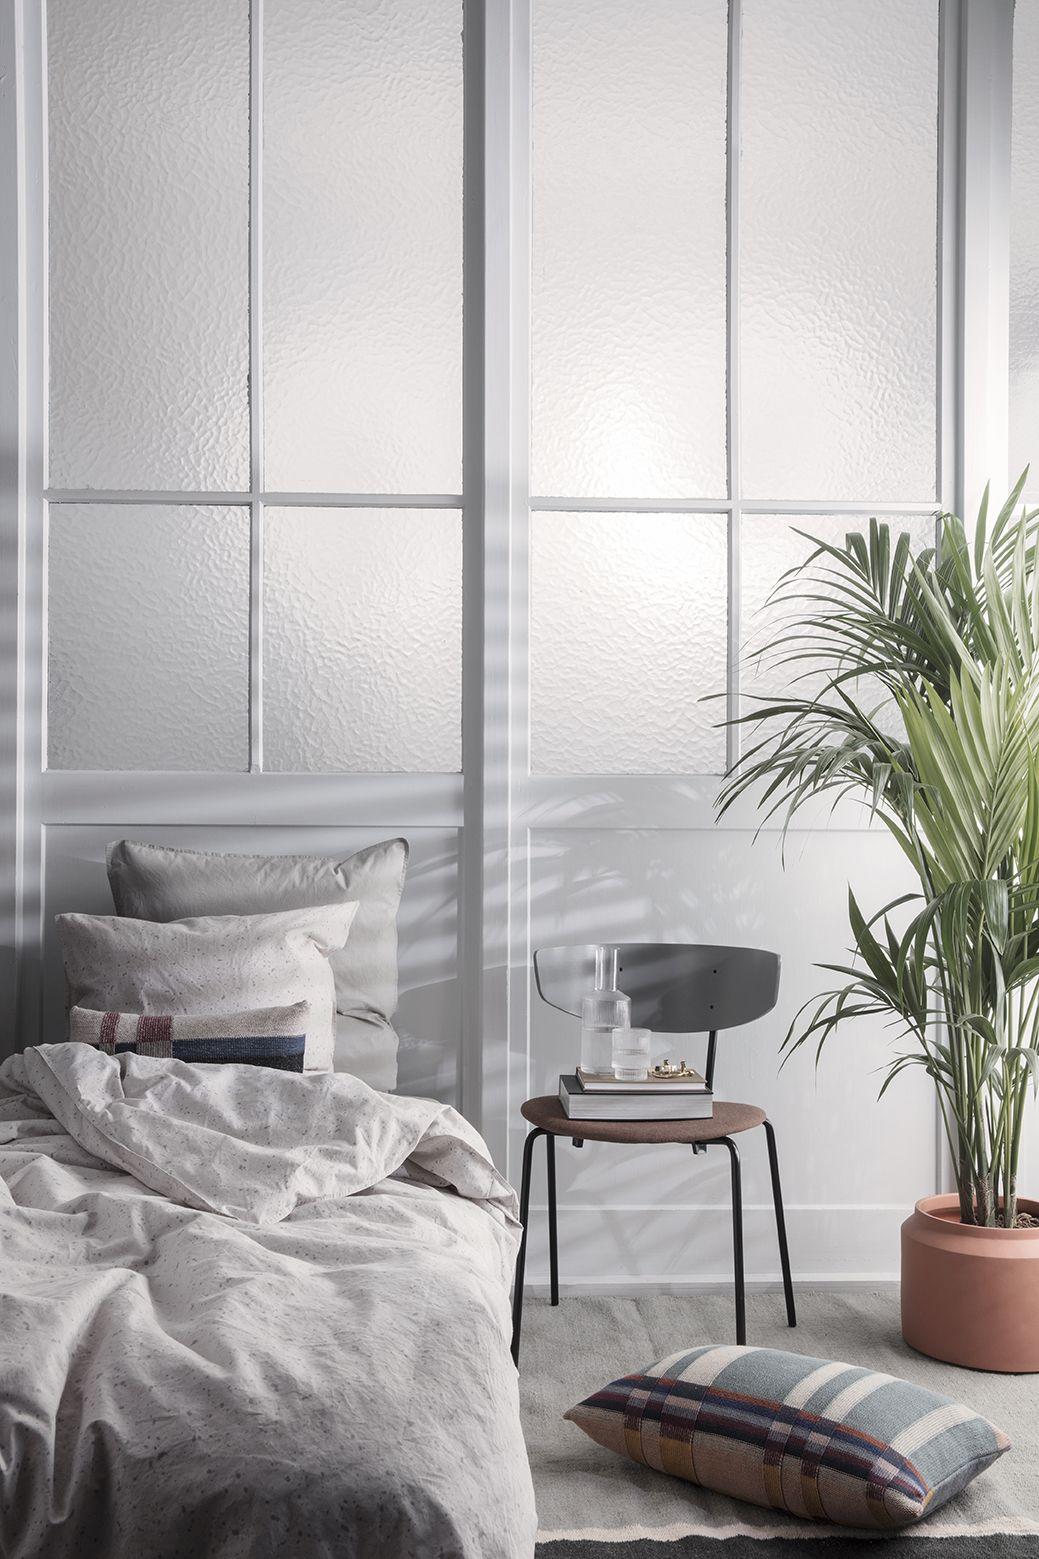 ferm living medley strick kissen 40 x 25 cm dunkelblau schlafzimmer pinterest bett. Black Bedroom Furniture Sets. Home Design Ideas